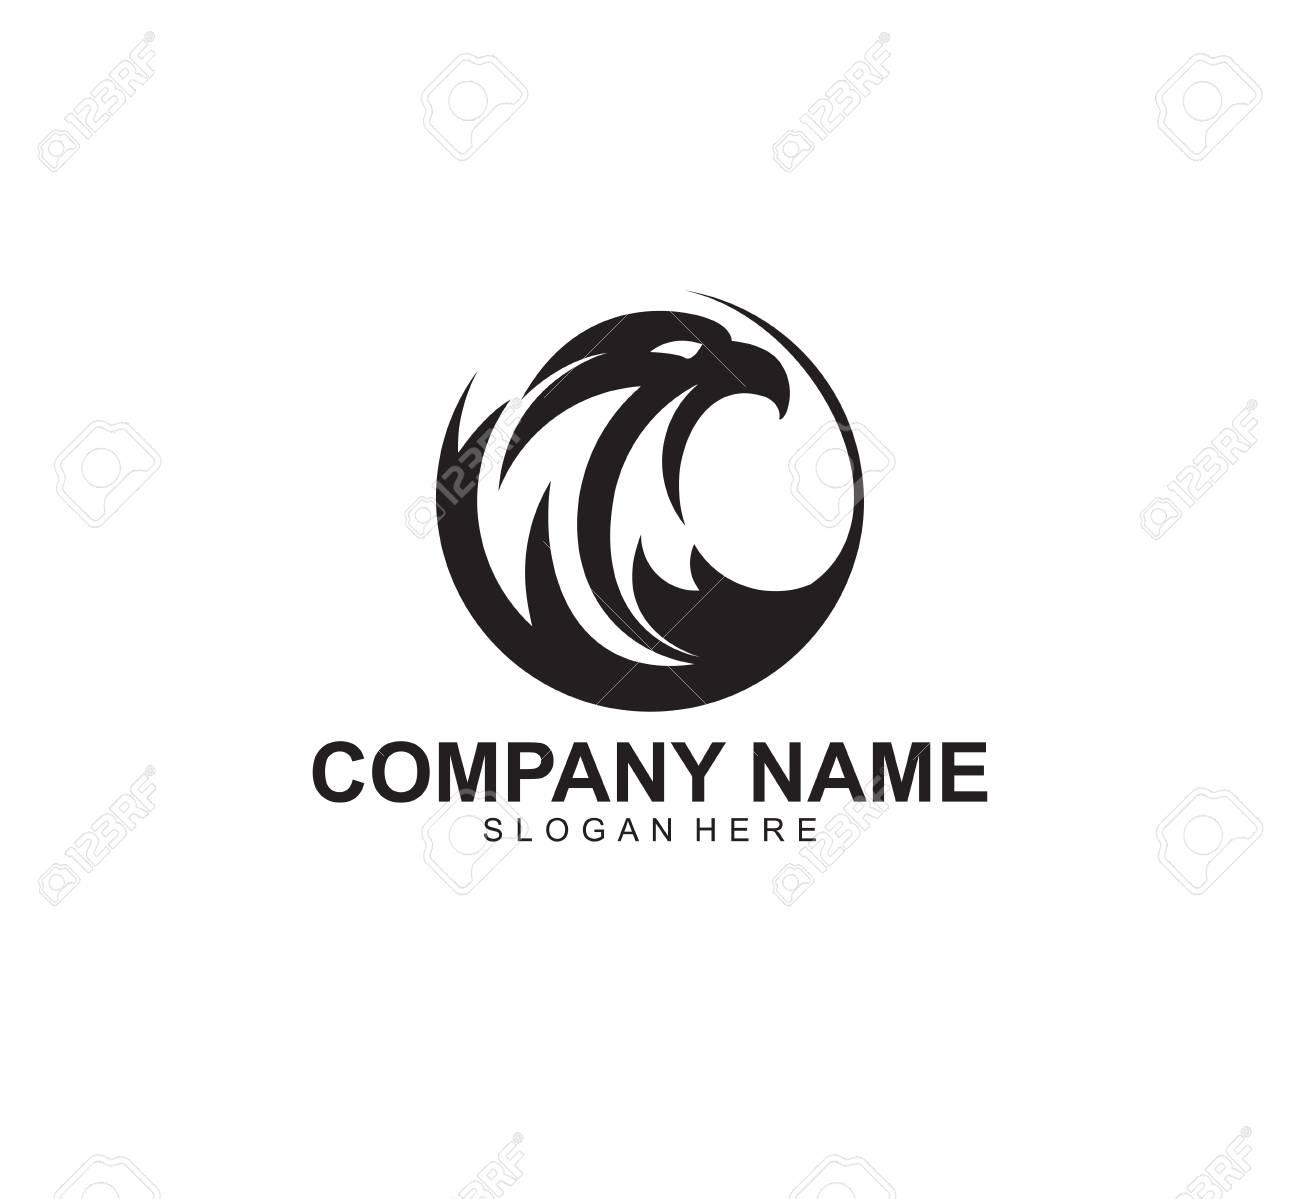 Mighty Eagle Vector Icon Logo Design Inspiration That Represents